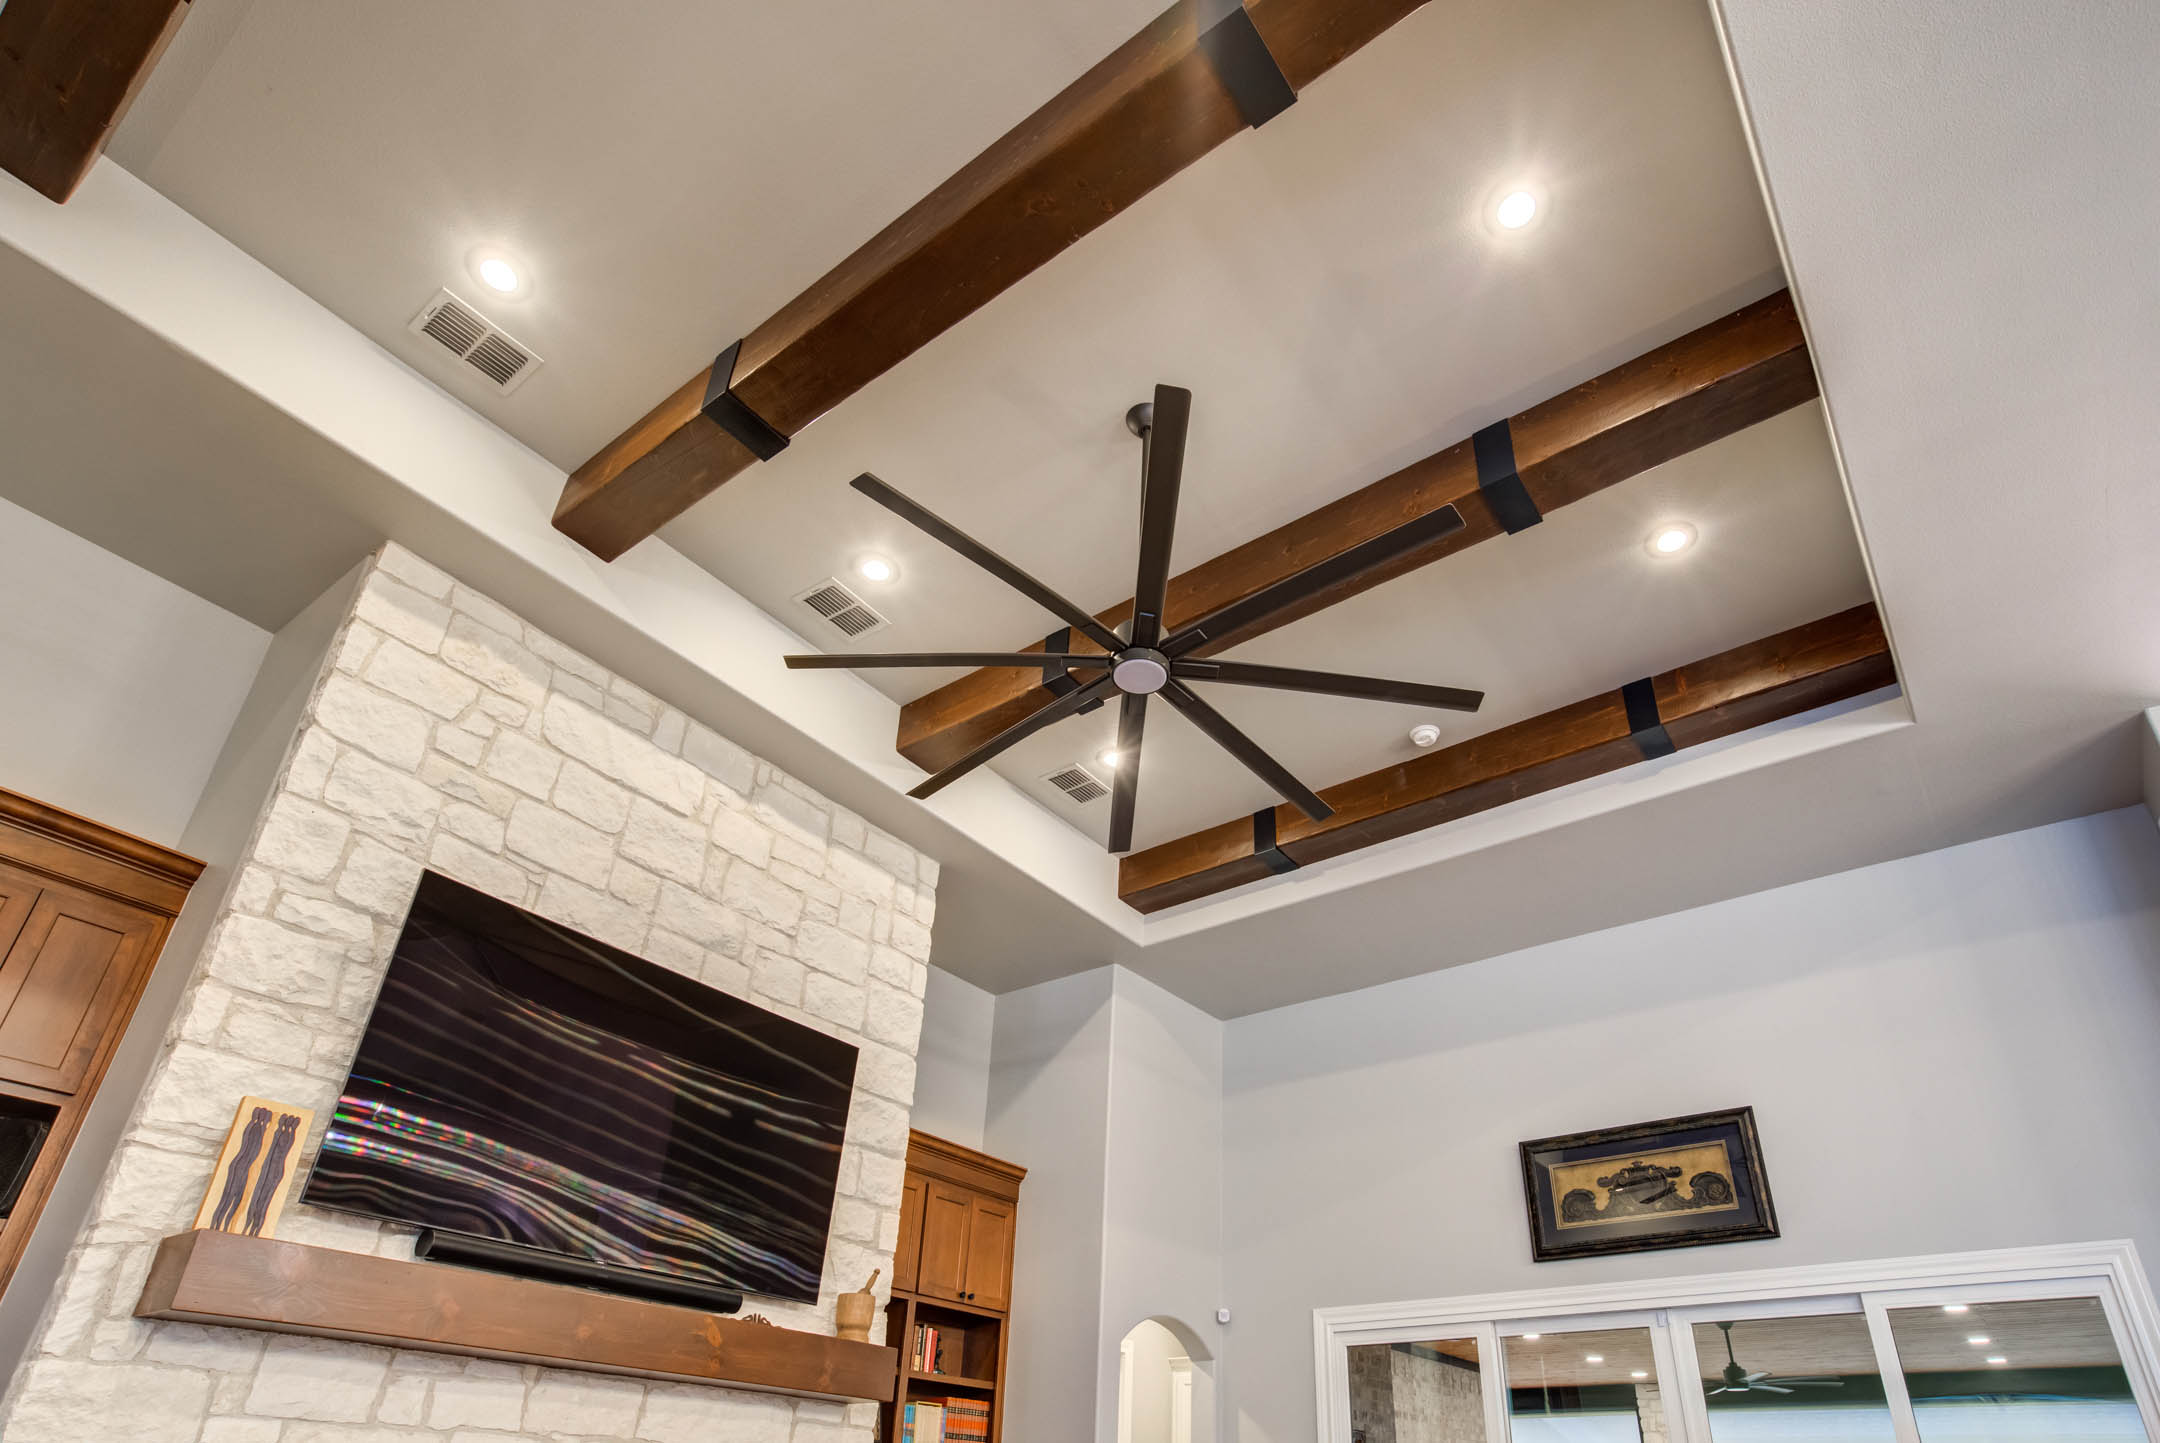 Detail of ceiling in living area of custom home in Lubbock.